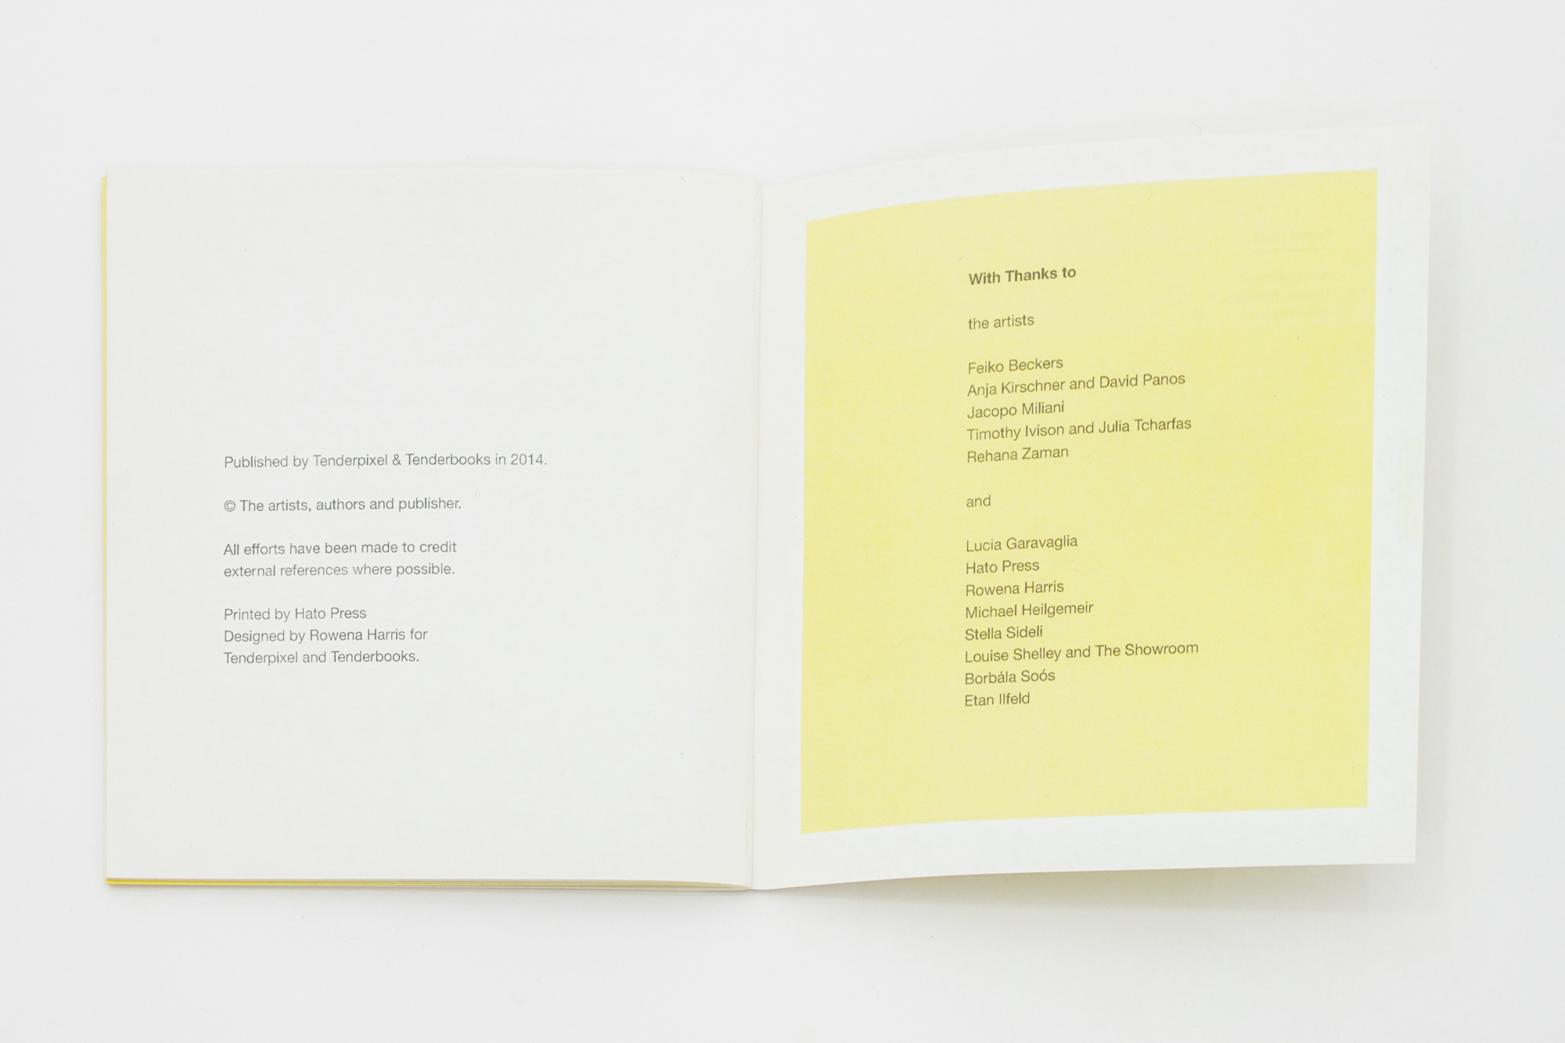 Exhibition handout, designed by Rowena Harris for Tenderpixel